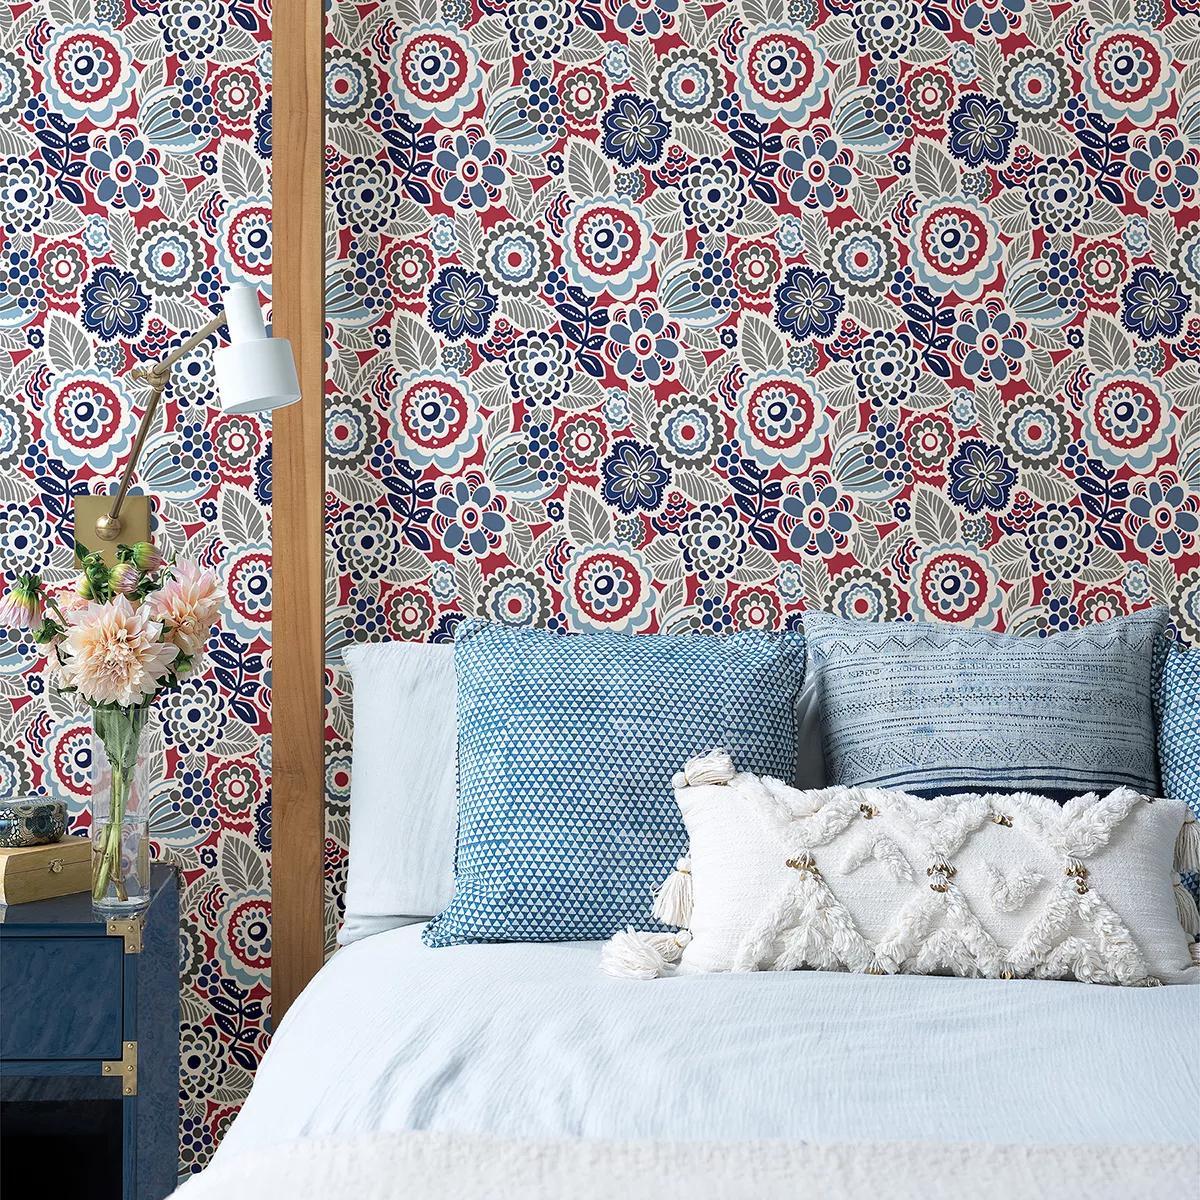 Piros kék virágmintás vlies dekor tapéta rajzolt skandináv stílusú virágmintával